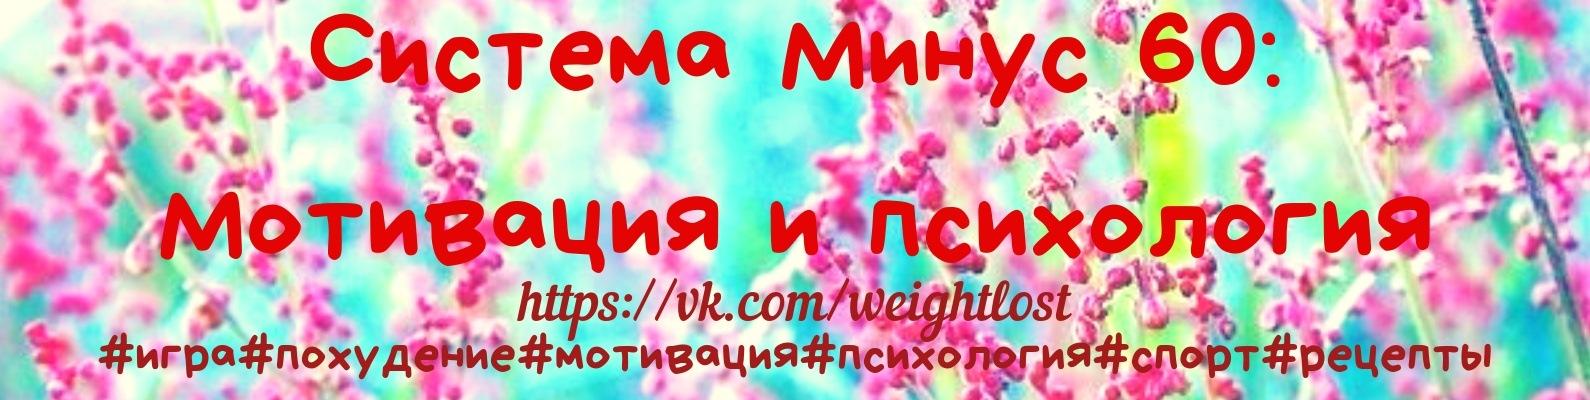 Рацион на 4 недели – 29 фотографий | вконтакте | спорт, диета.